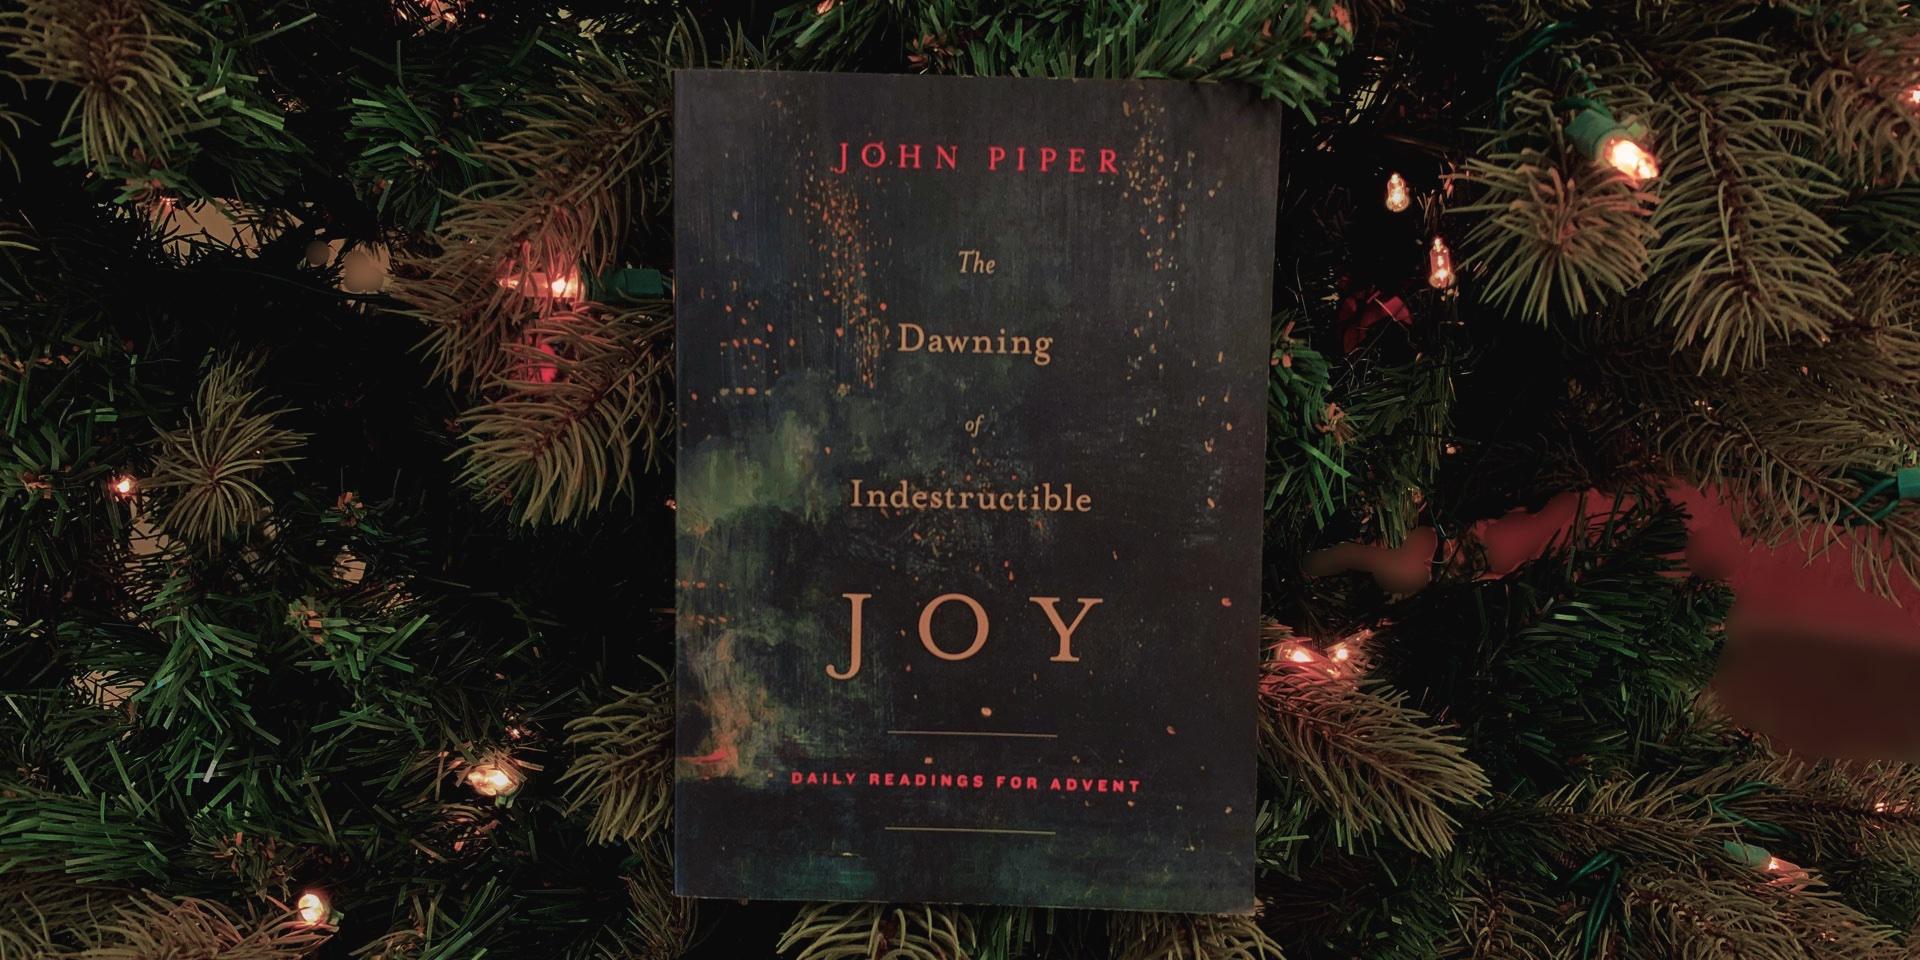 The Dawning of Indestructible Joy - Trinity Bible Church